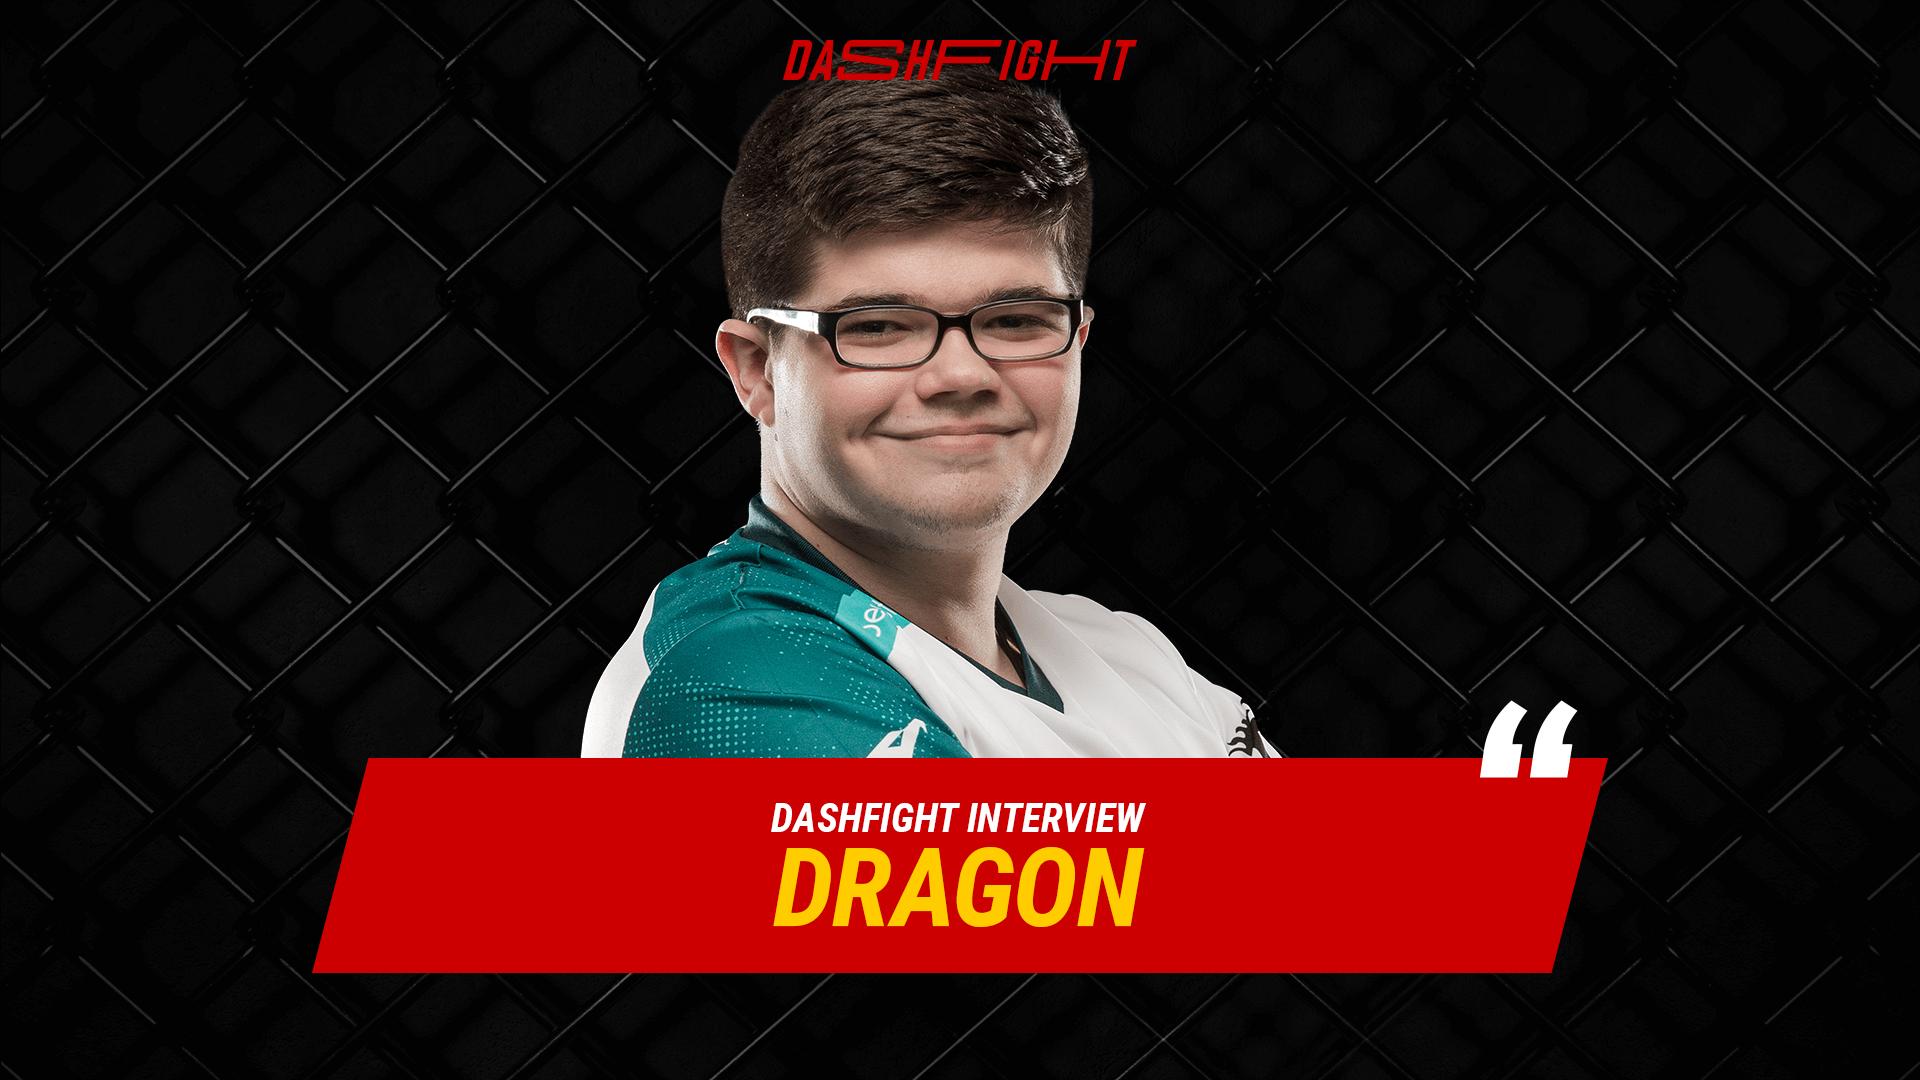 DashFight Video Interview: Dragon